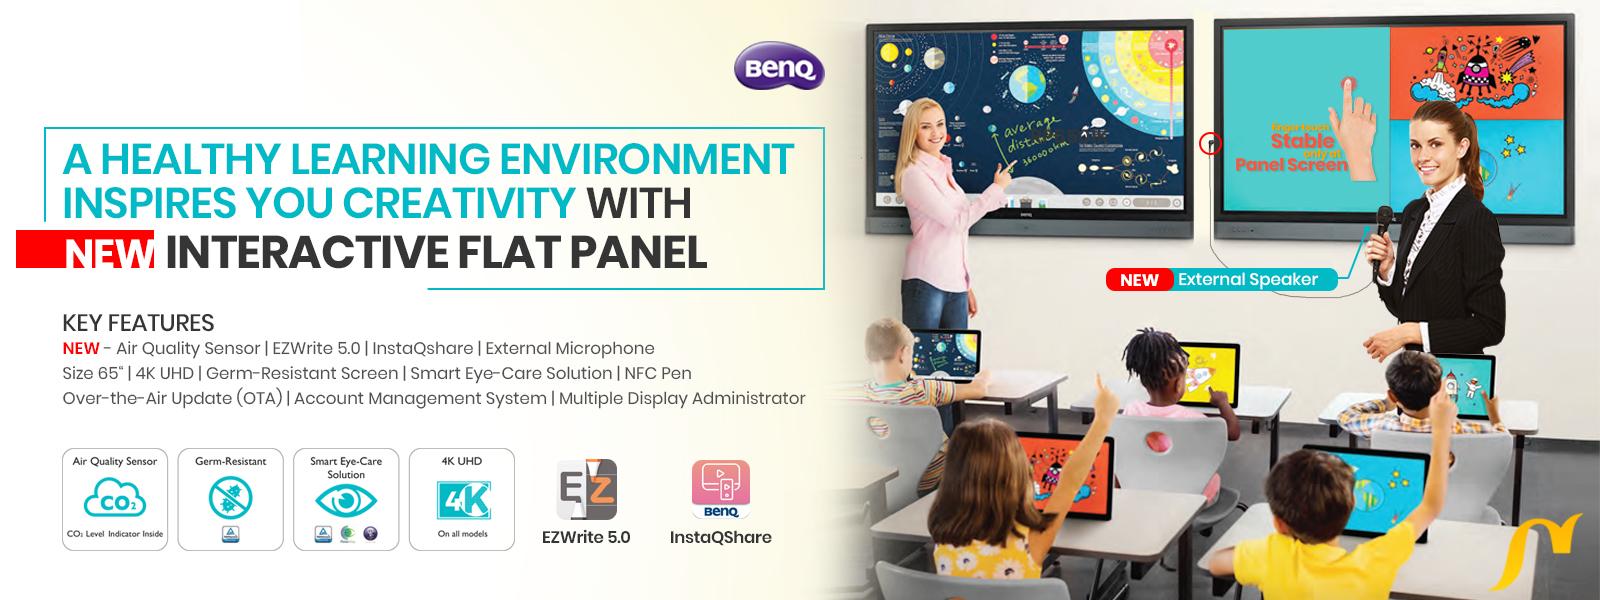 new benq interactive flat panel for education slider